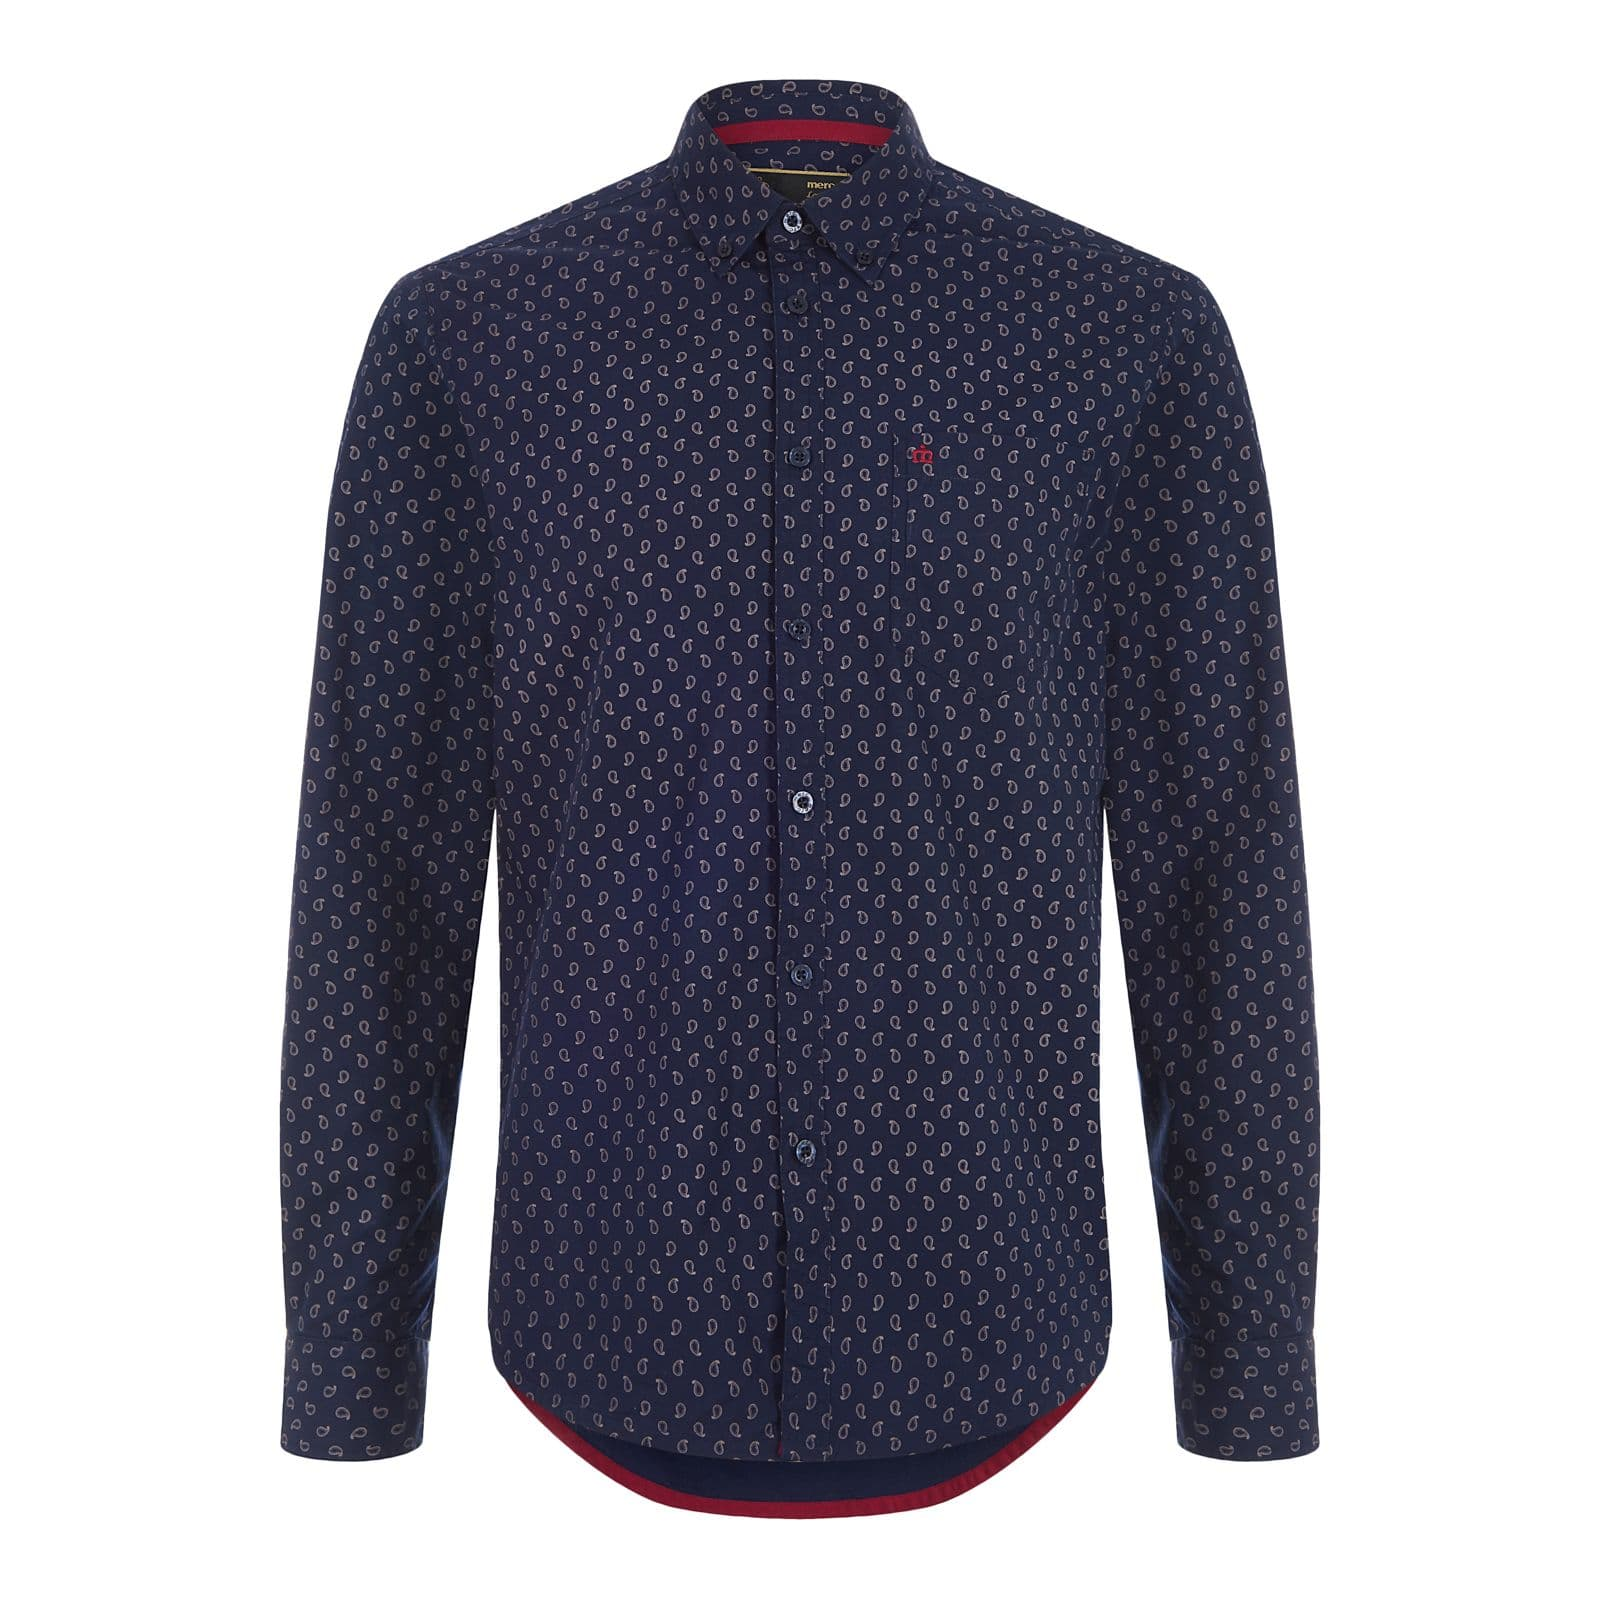 Рубашка LennoxРубашки под заказ<br><br><br>Артикул: 1517107<br>Материал: 100% хлопок<br>Цвет: синий<br>Пол: Мужской